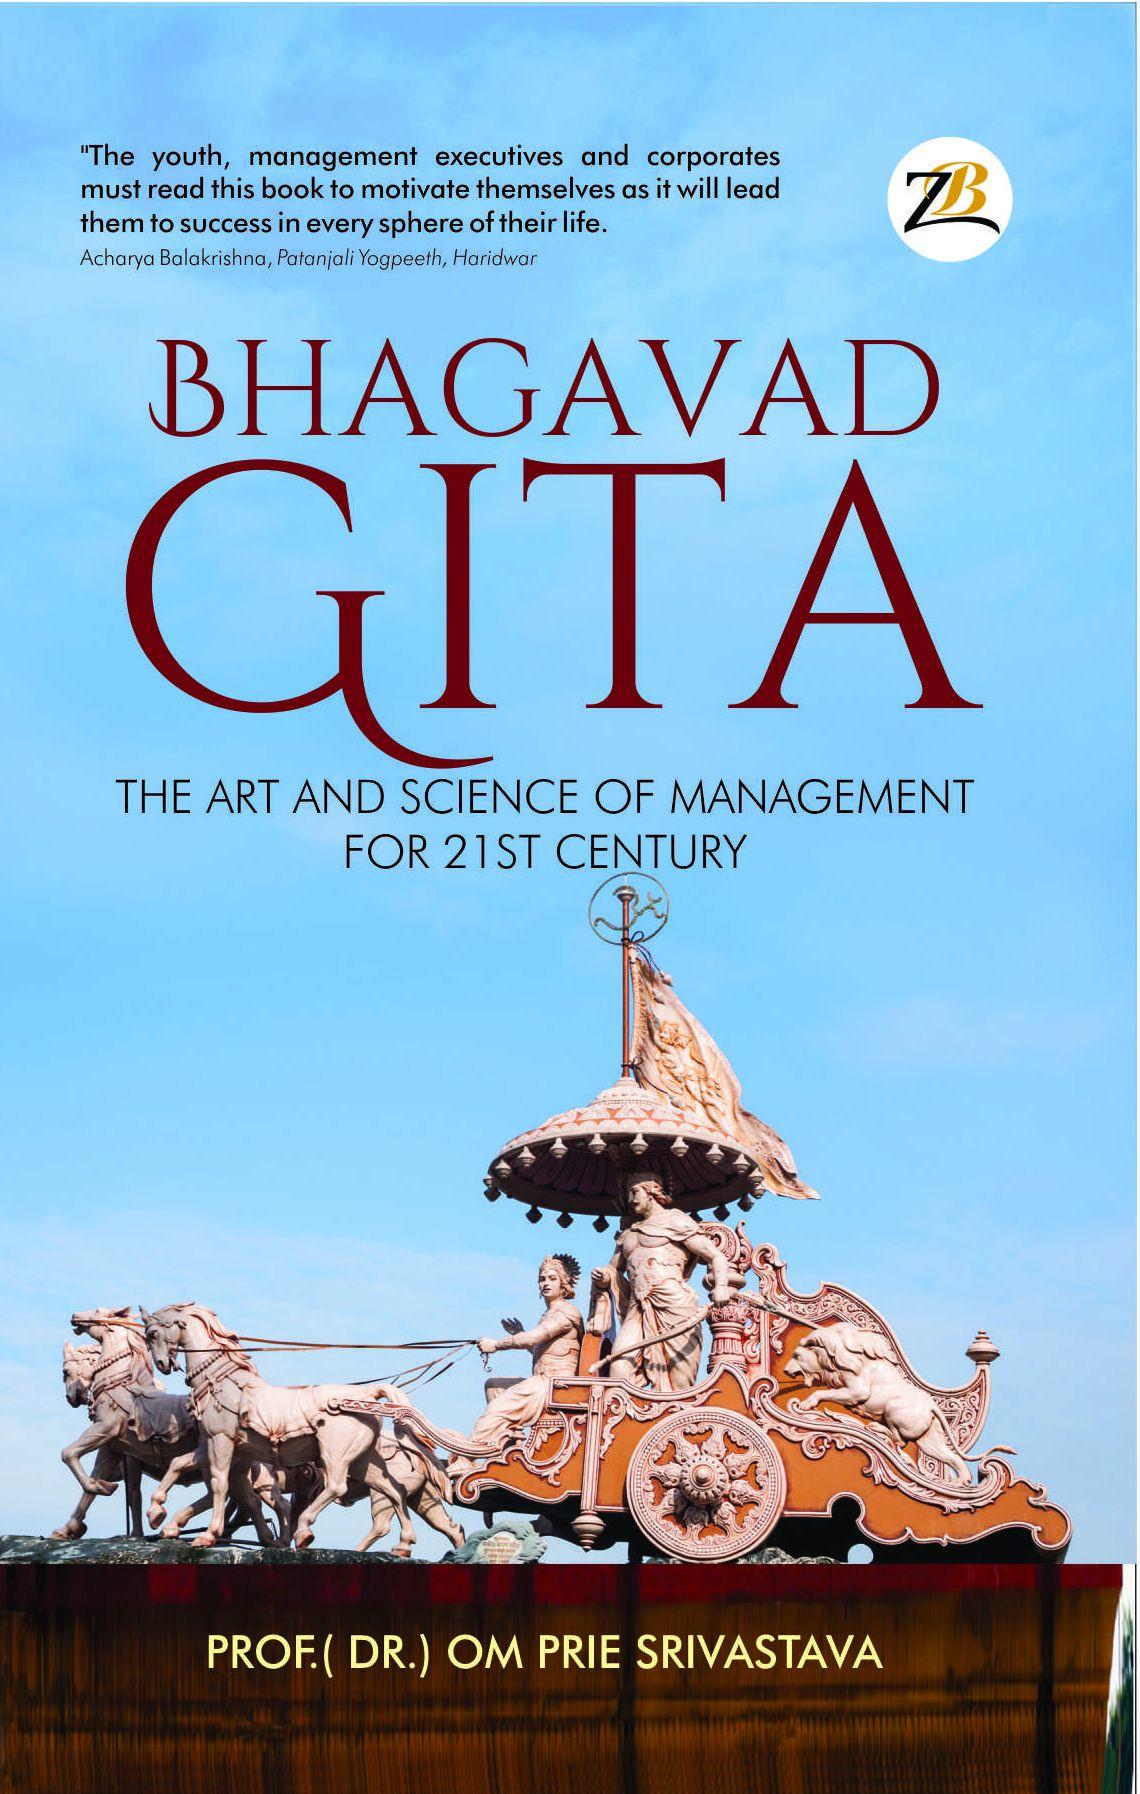 bhagwat geeta in hindi book pdf